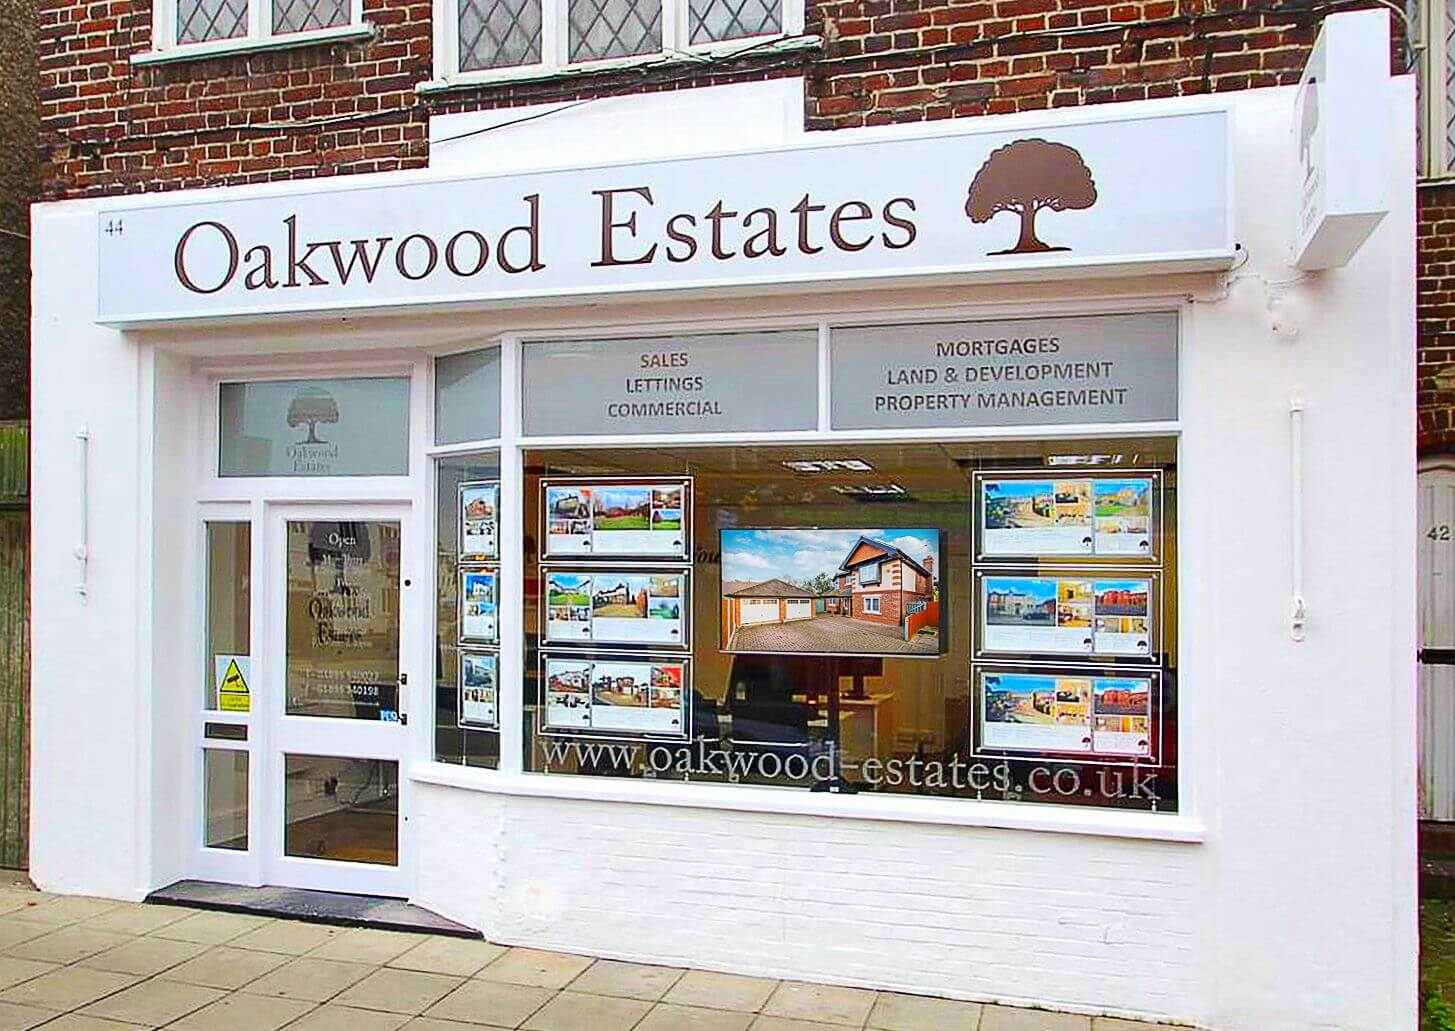 Oakwood of West Drayton